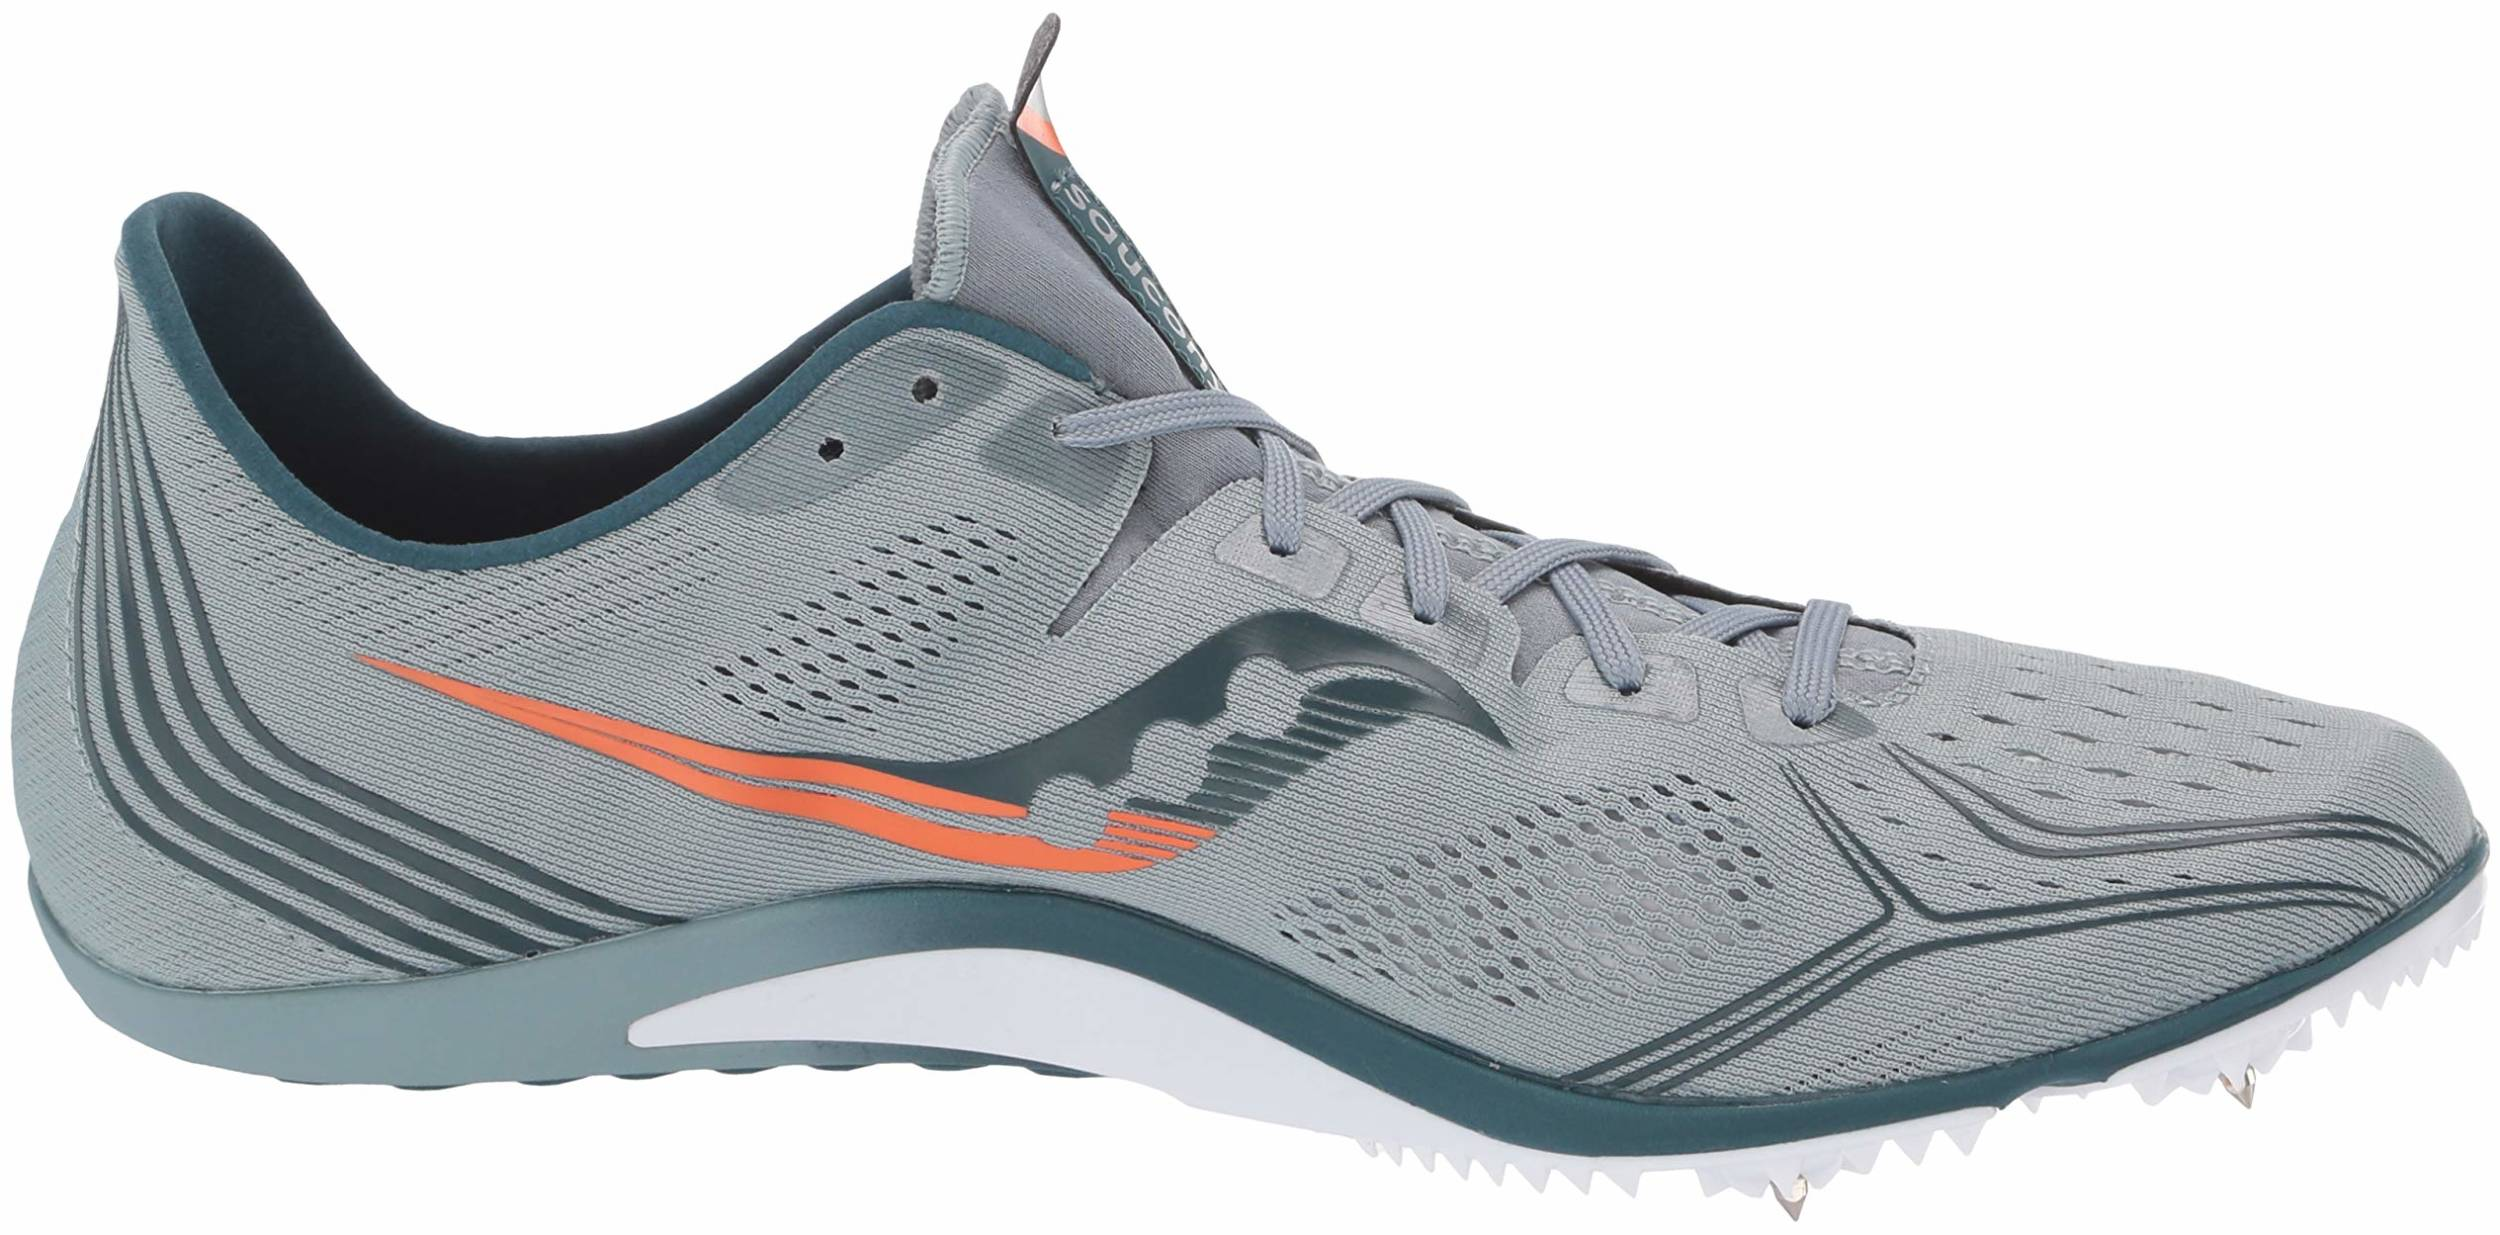 Save 80% on Saucony Track \u0026 Field Shoes